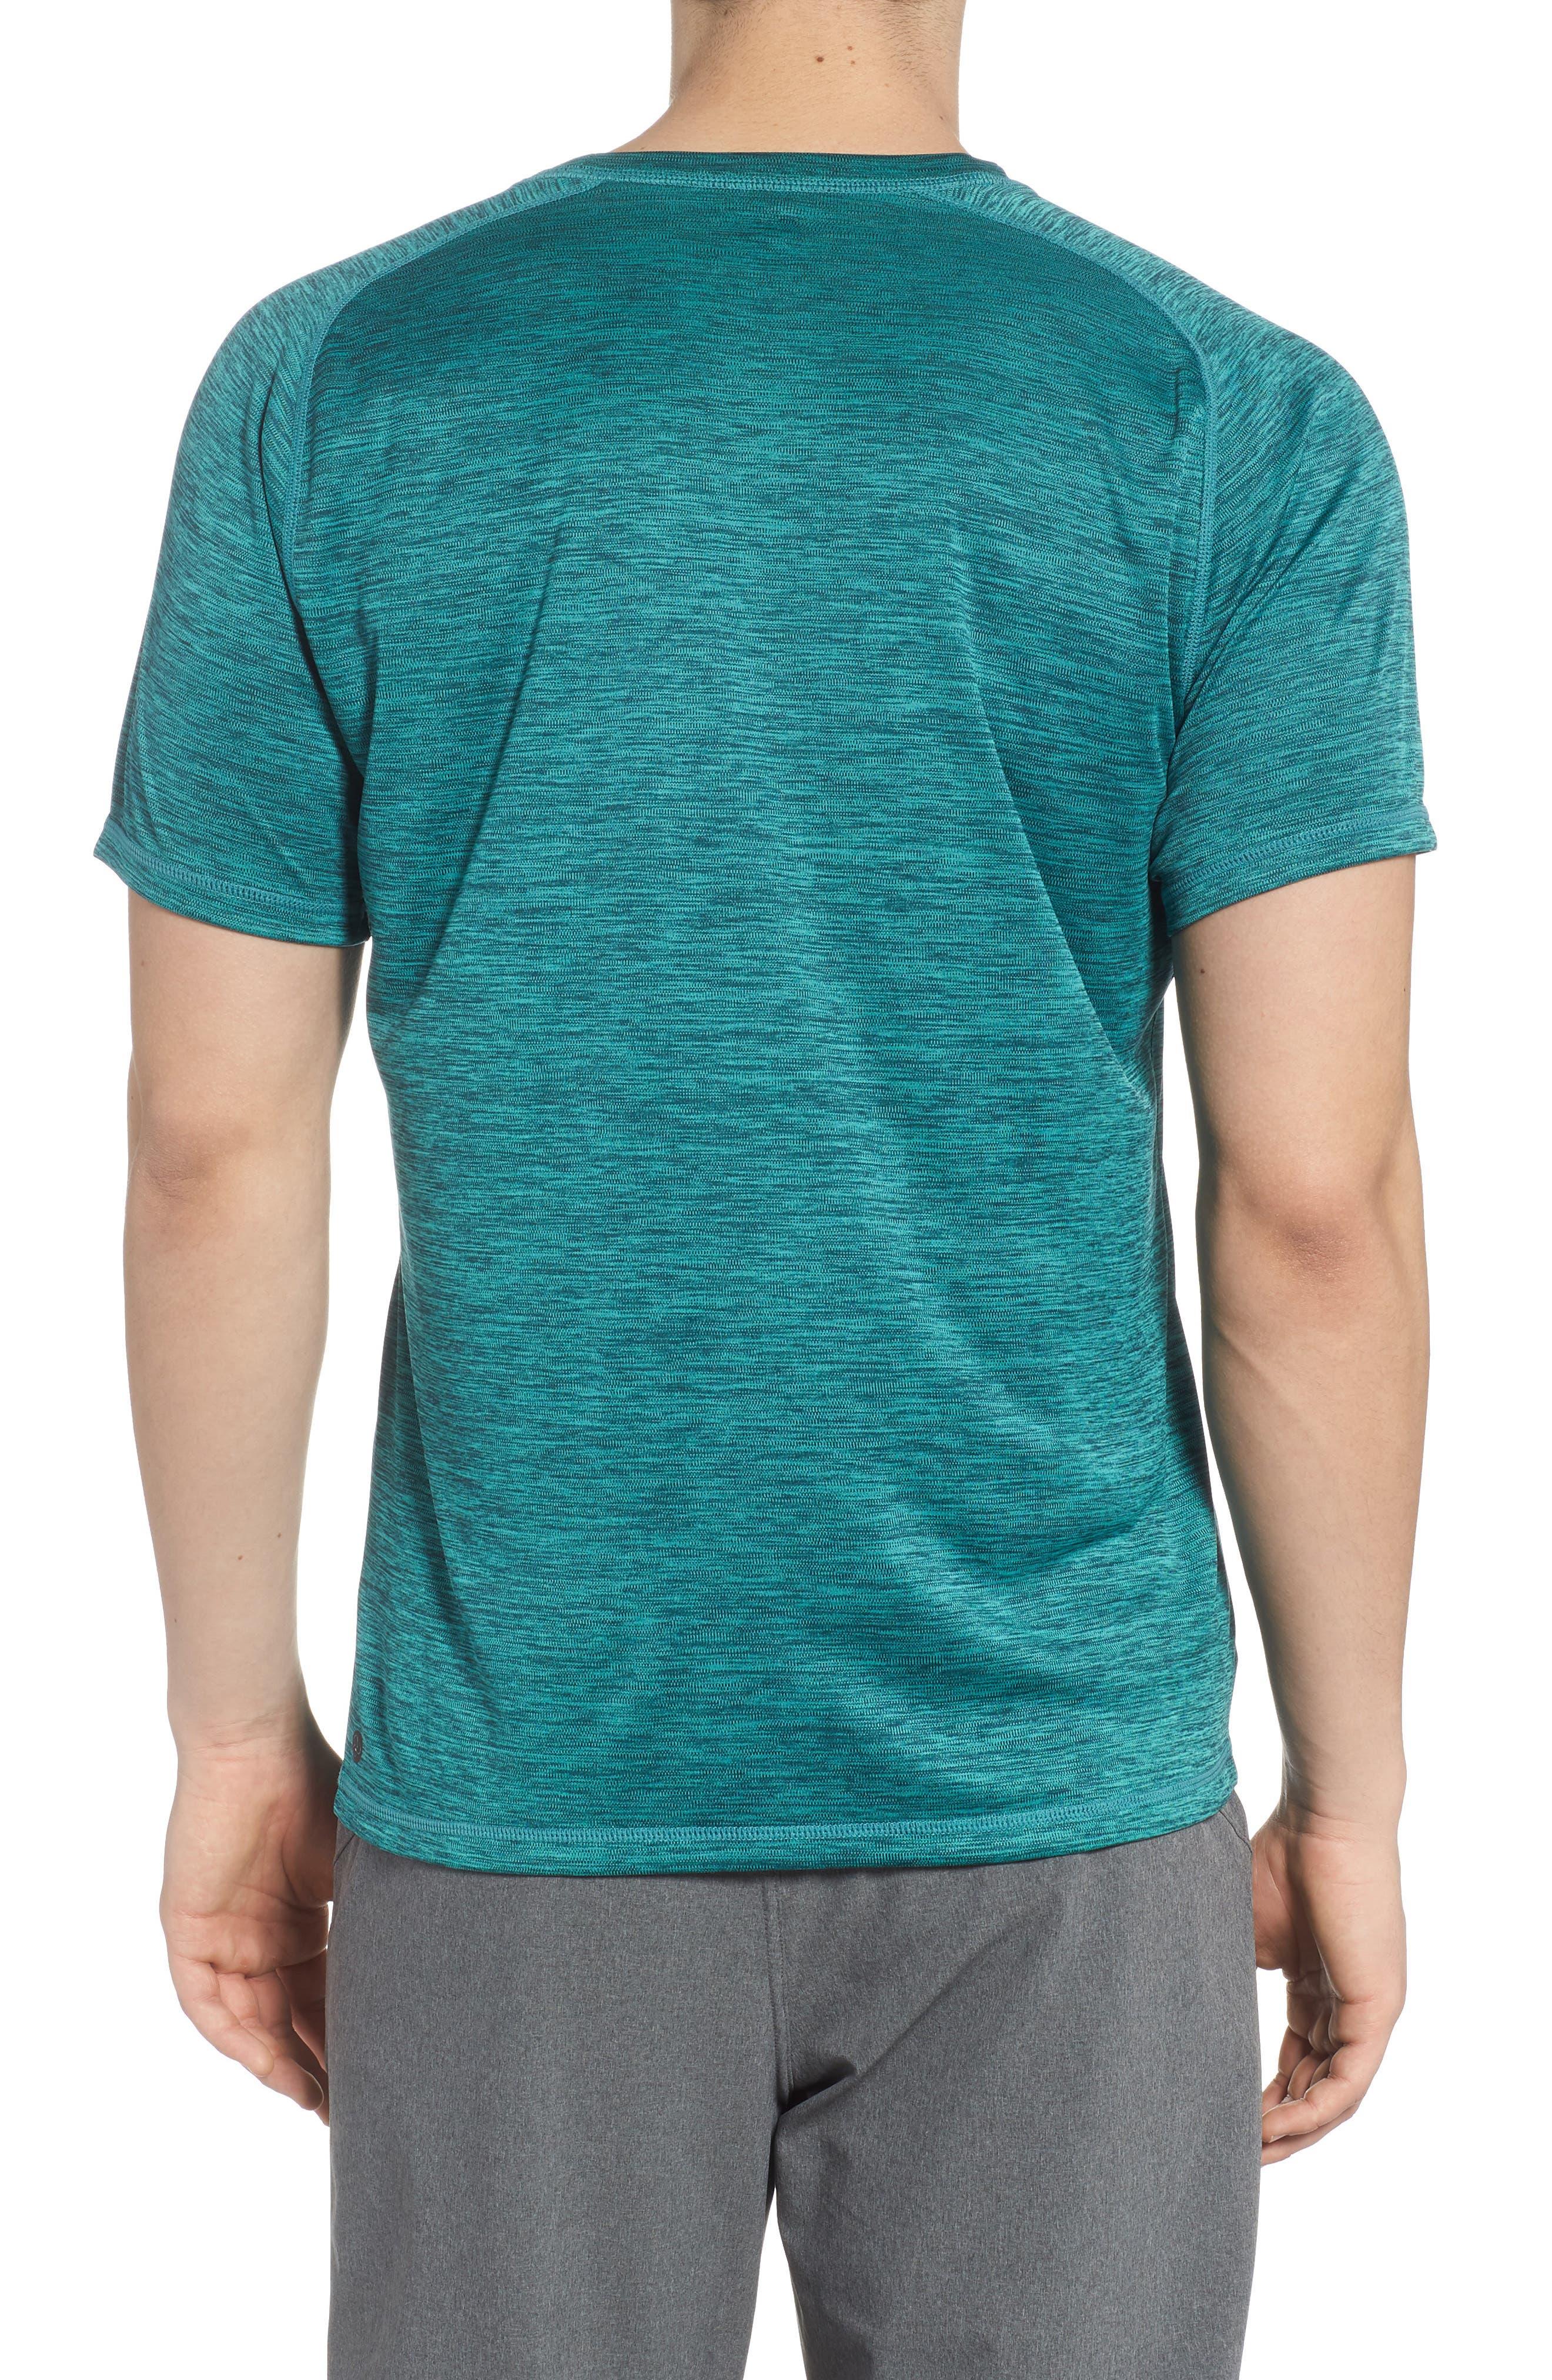 Triplite T-Shirt,                             Alternate thumbnail 2, color,                             Teal Tourmaline Melange